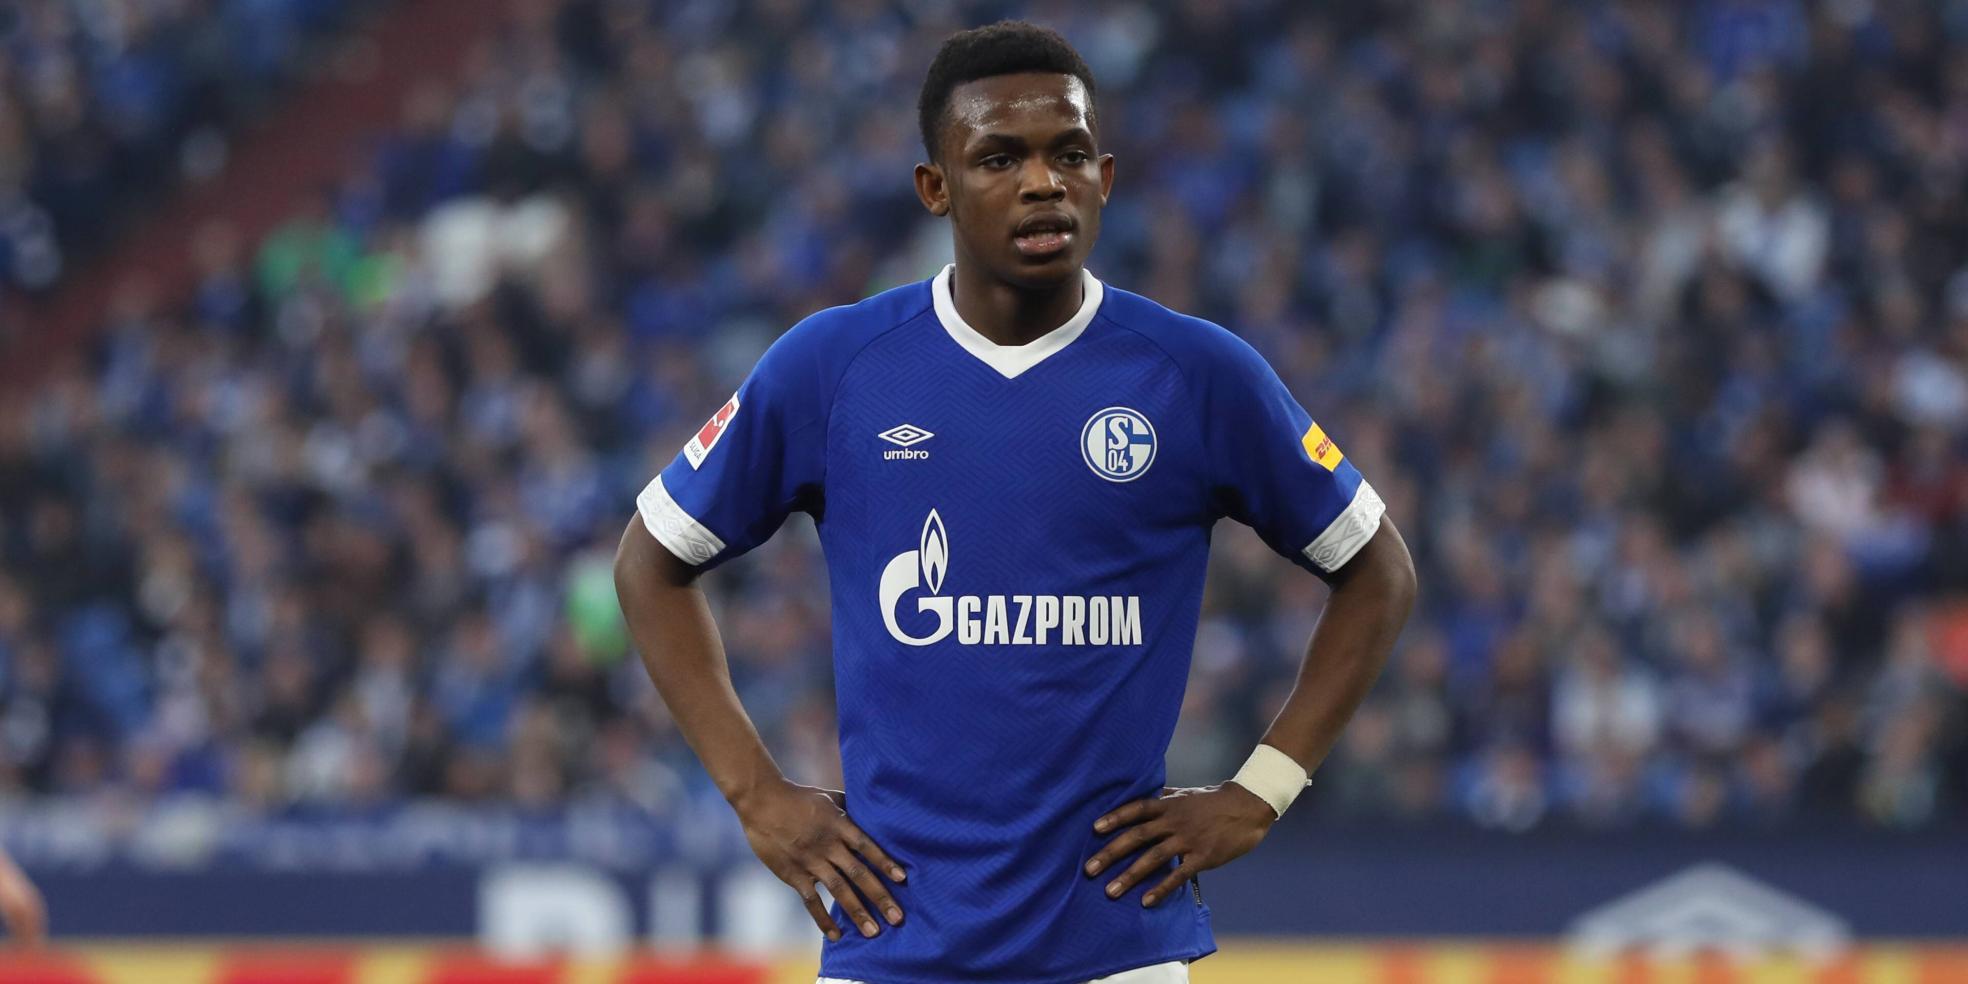 Rabbi Matondo vom FC Schalke 04